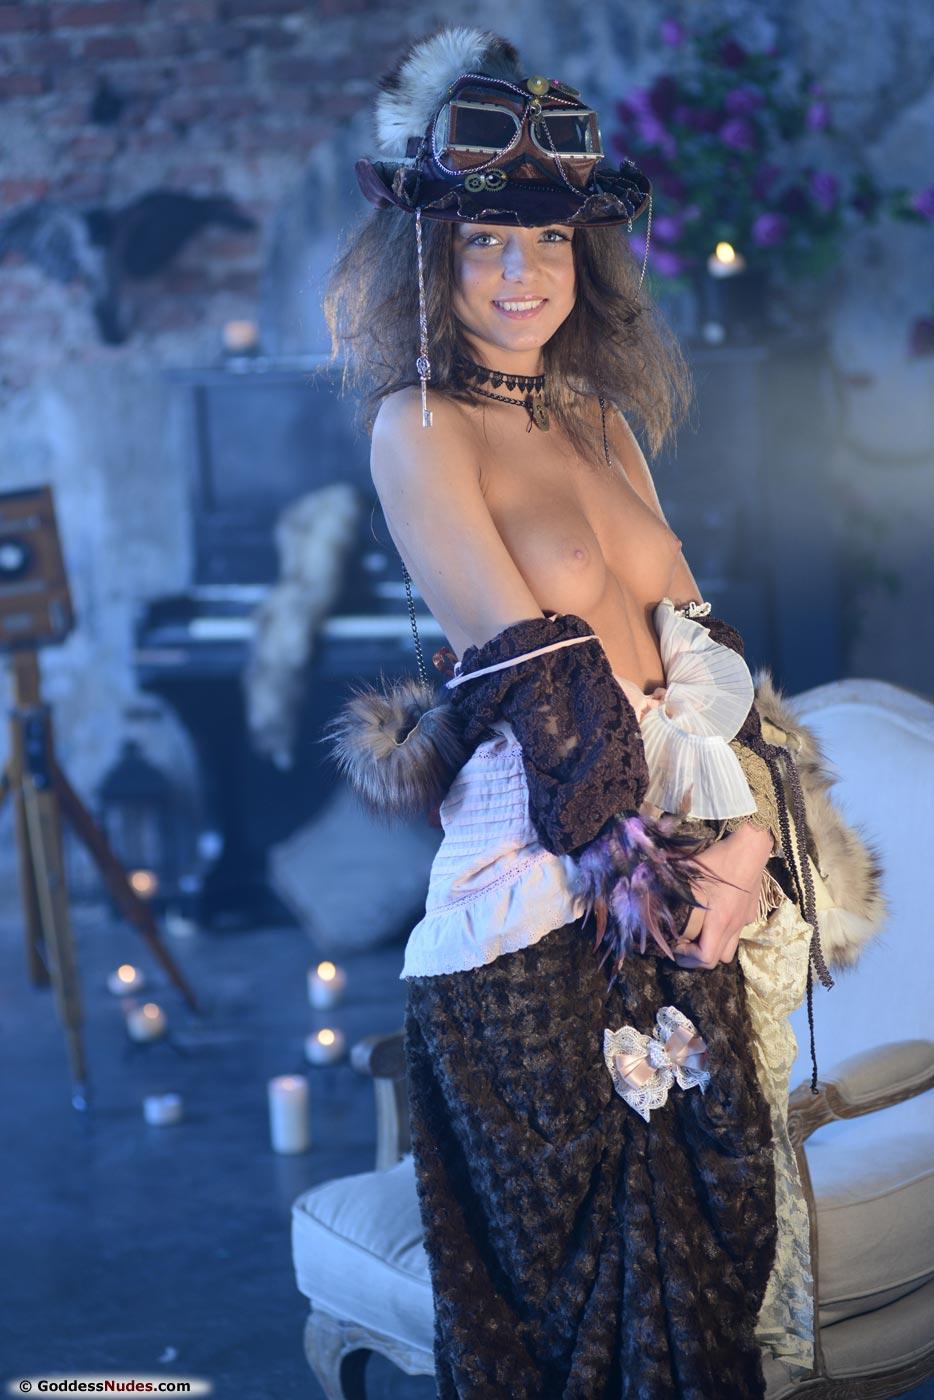 Amazing beauty Nensi nude photo gallery | Daily Girls @ Female Update